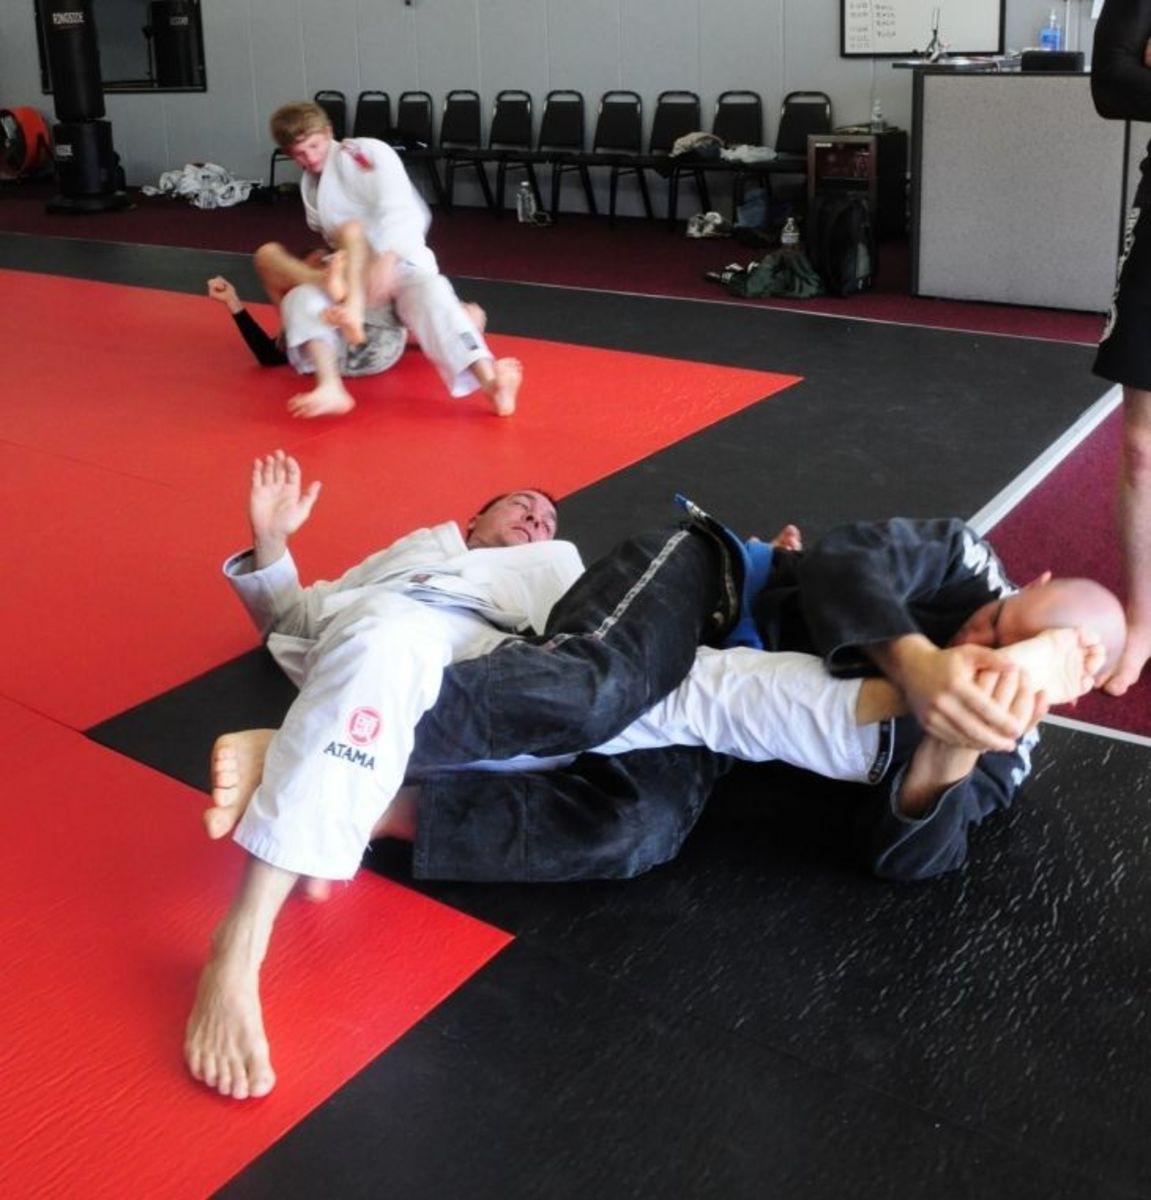 Applying a kneebar.